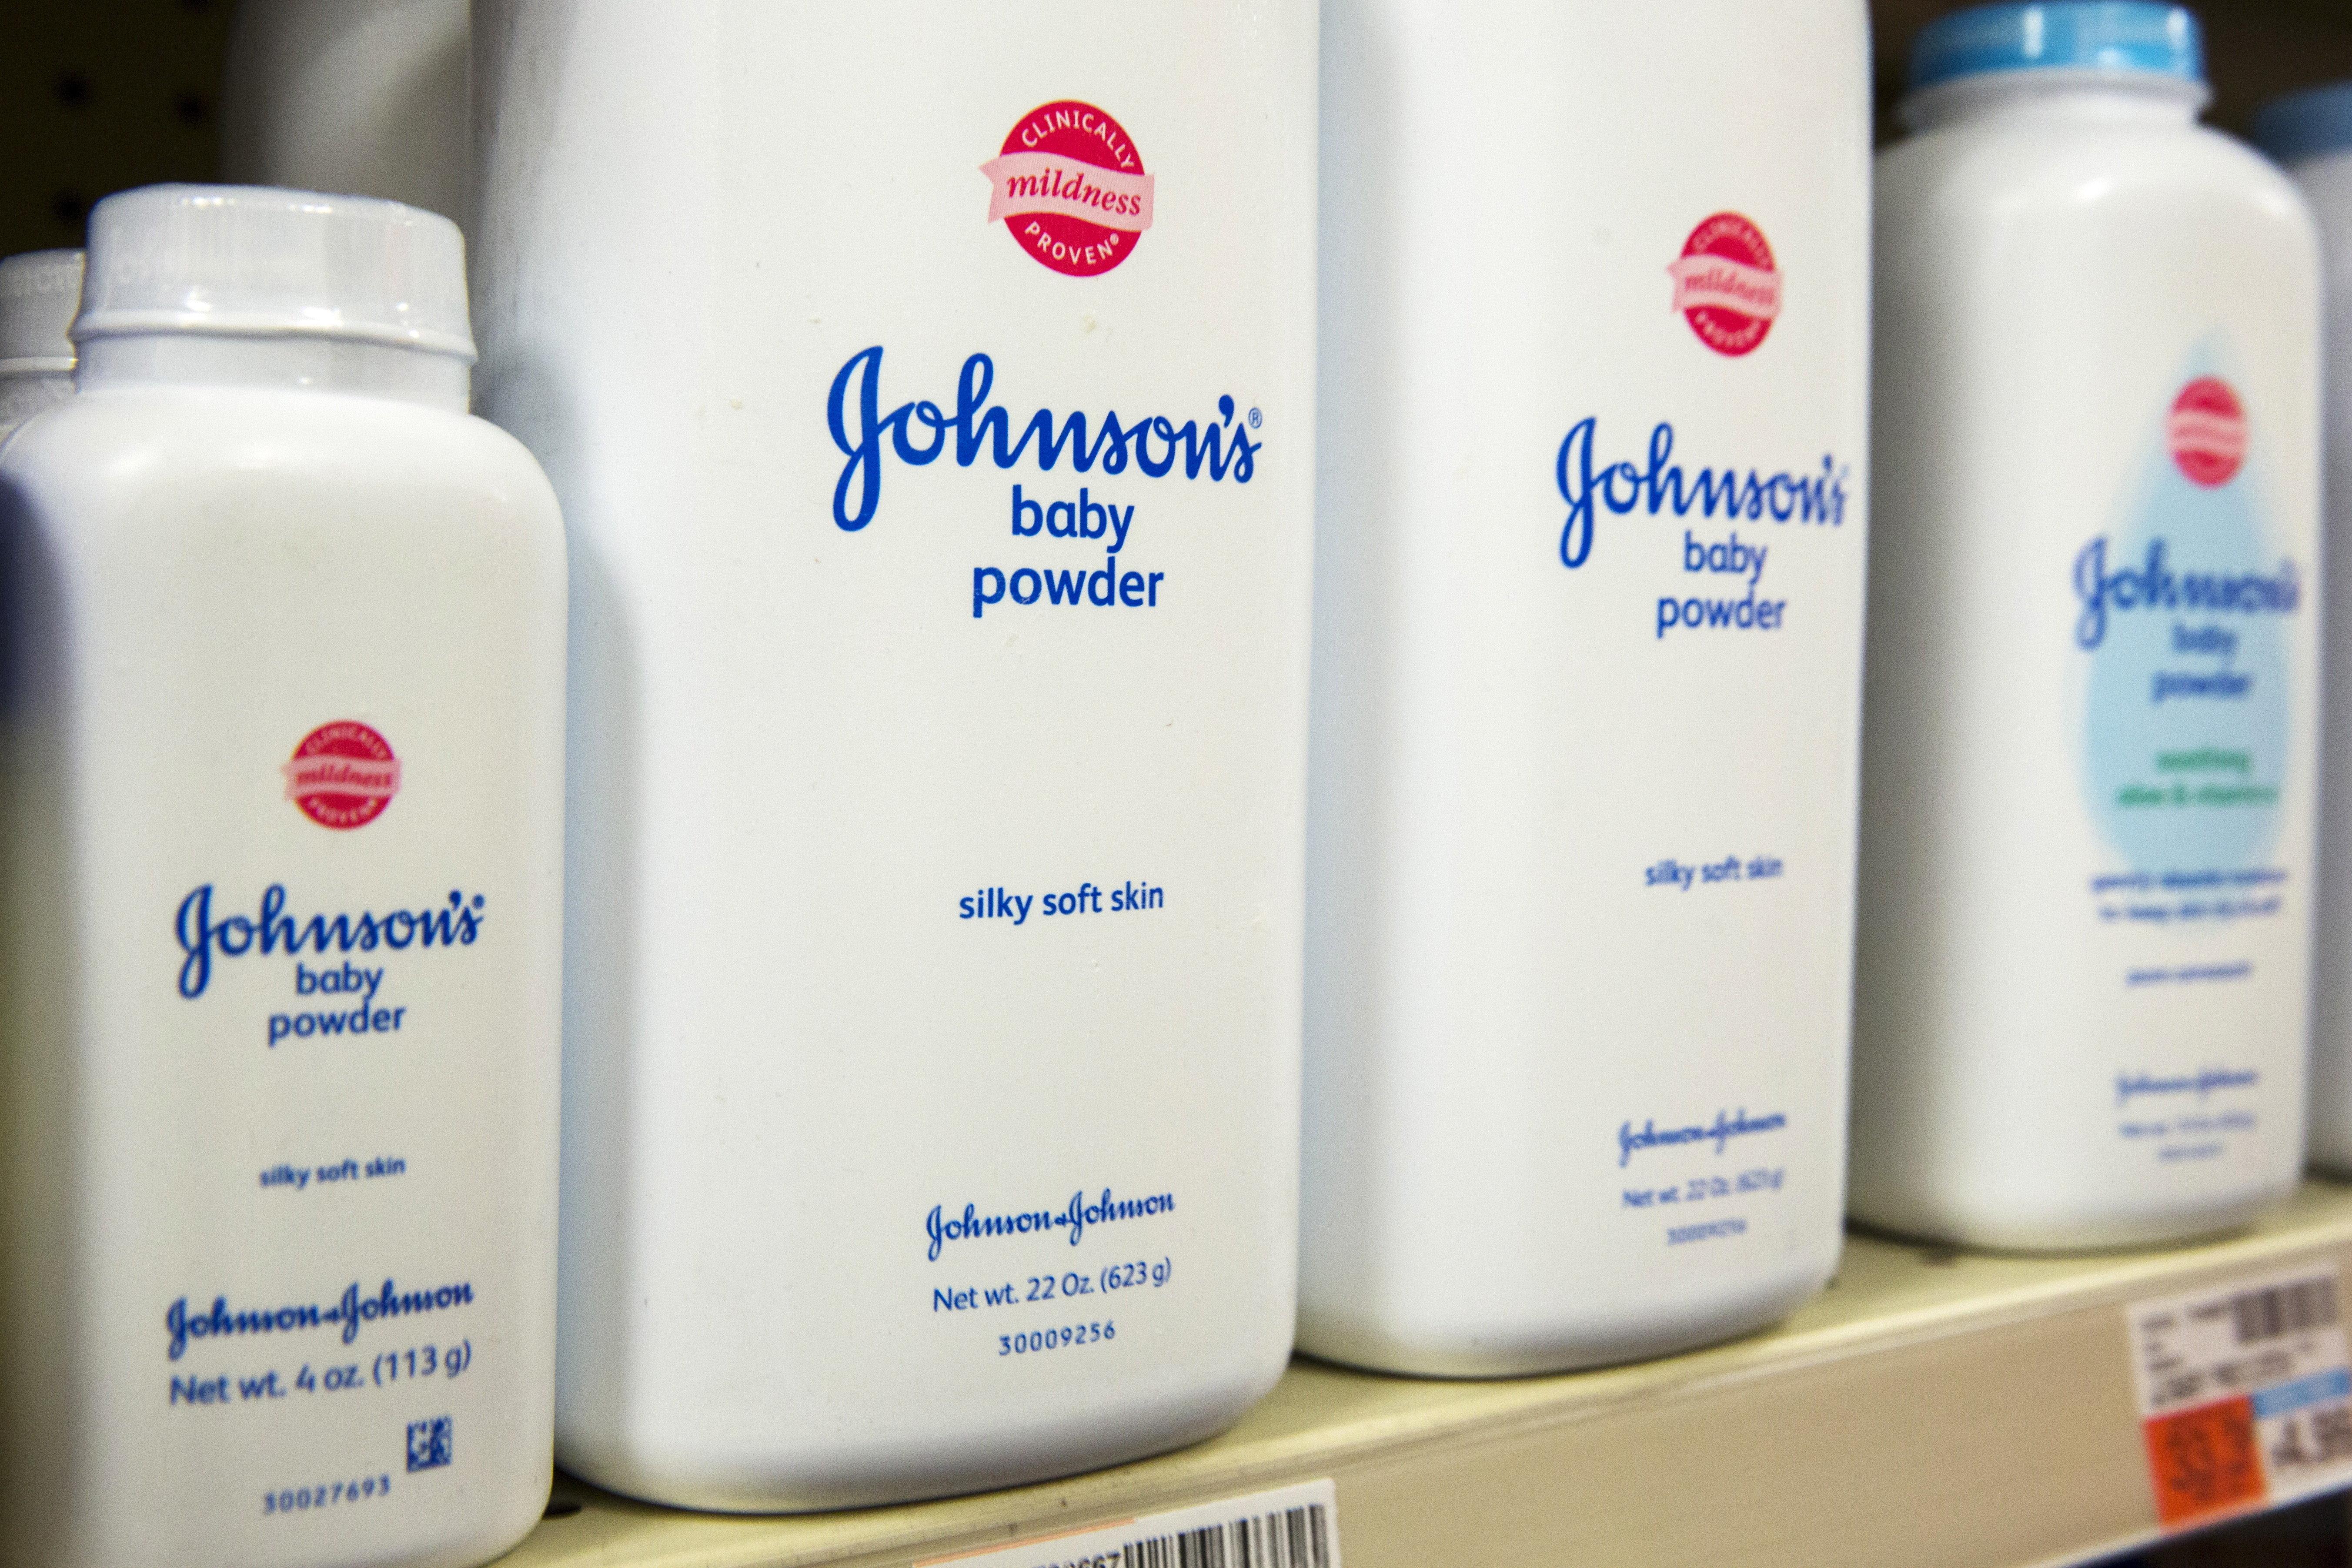 LA Jury Awards $417M to User of Johnson & Johnson Baby Powder